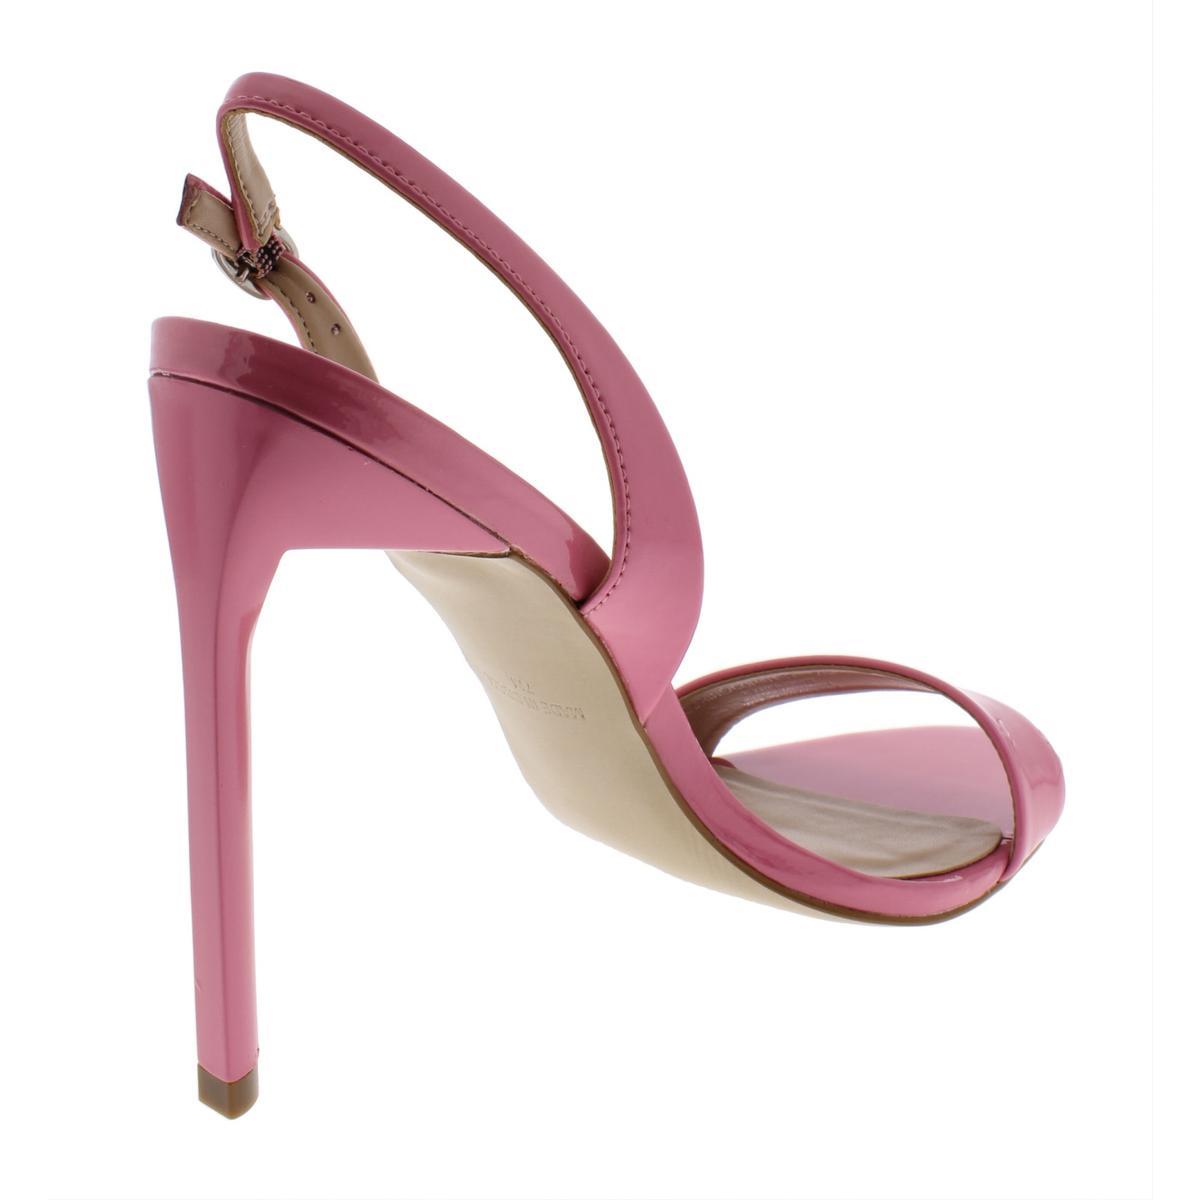 Steve-Madden-Womens-Corine-Patent-Leather-Stiletto-Dress-Sandals-Shoes-BHFO-2344 thumbnail 8